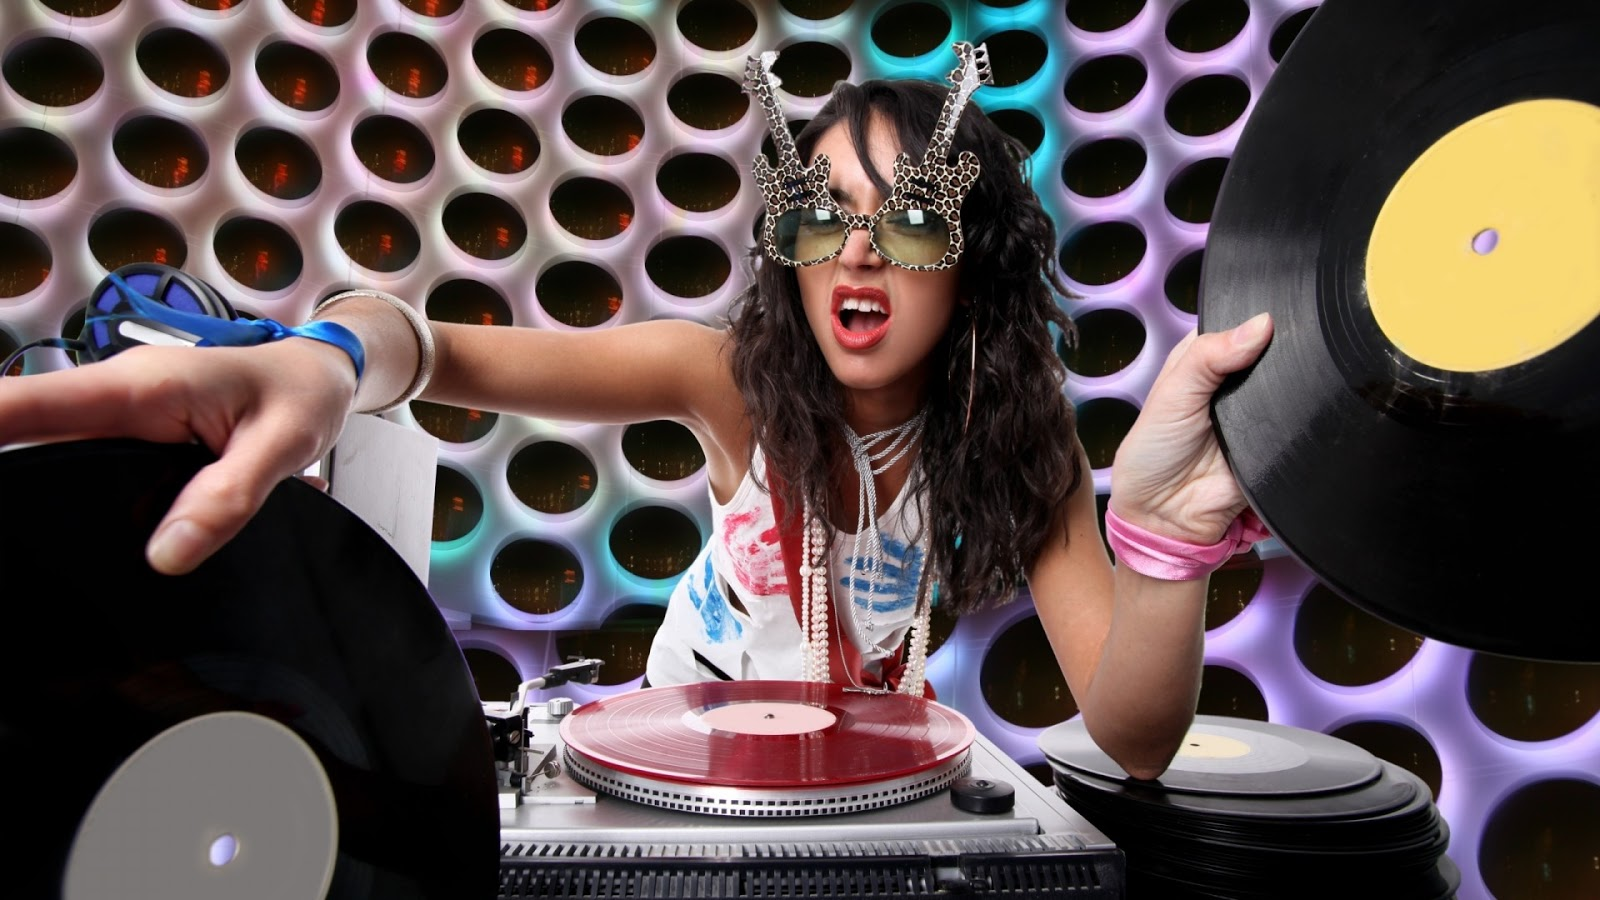 Funky DJ Girl HDQ Wallpapers 1600x900